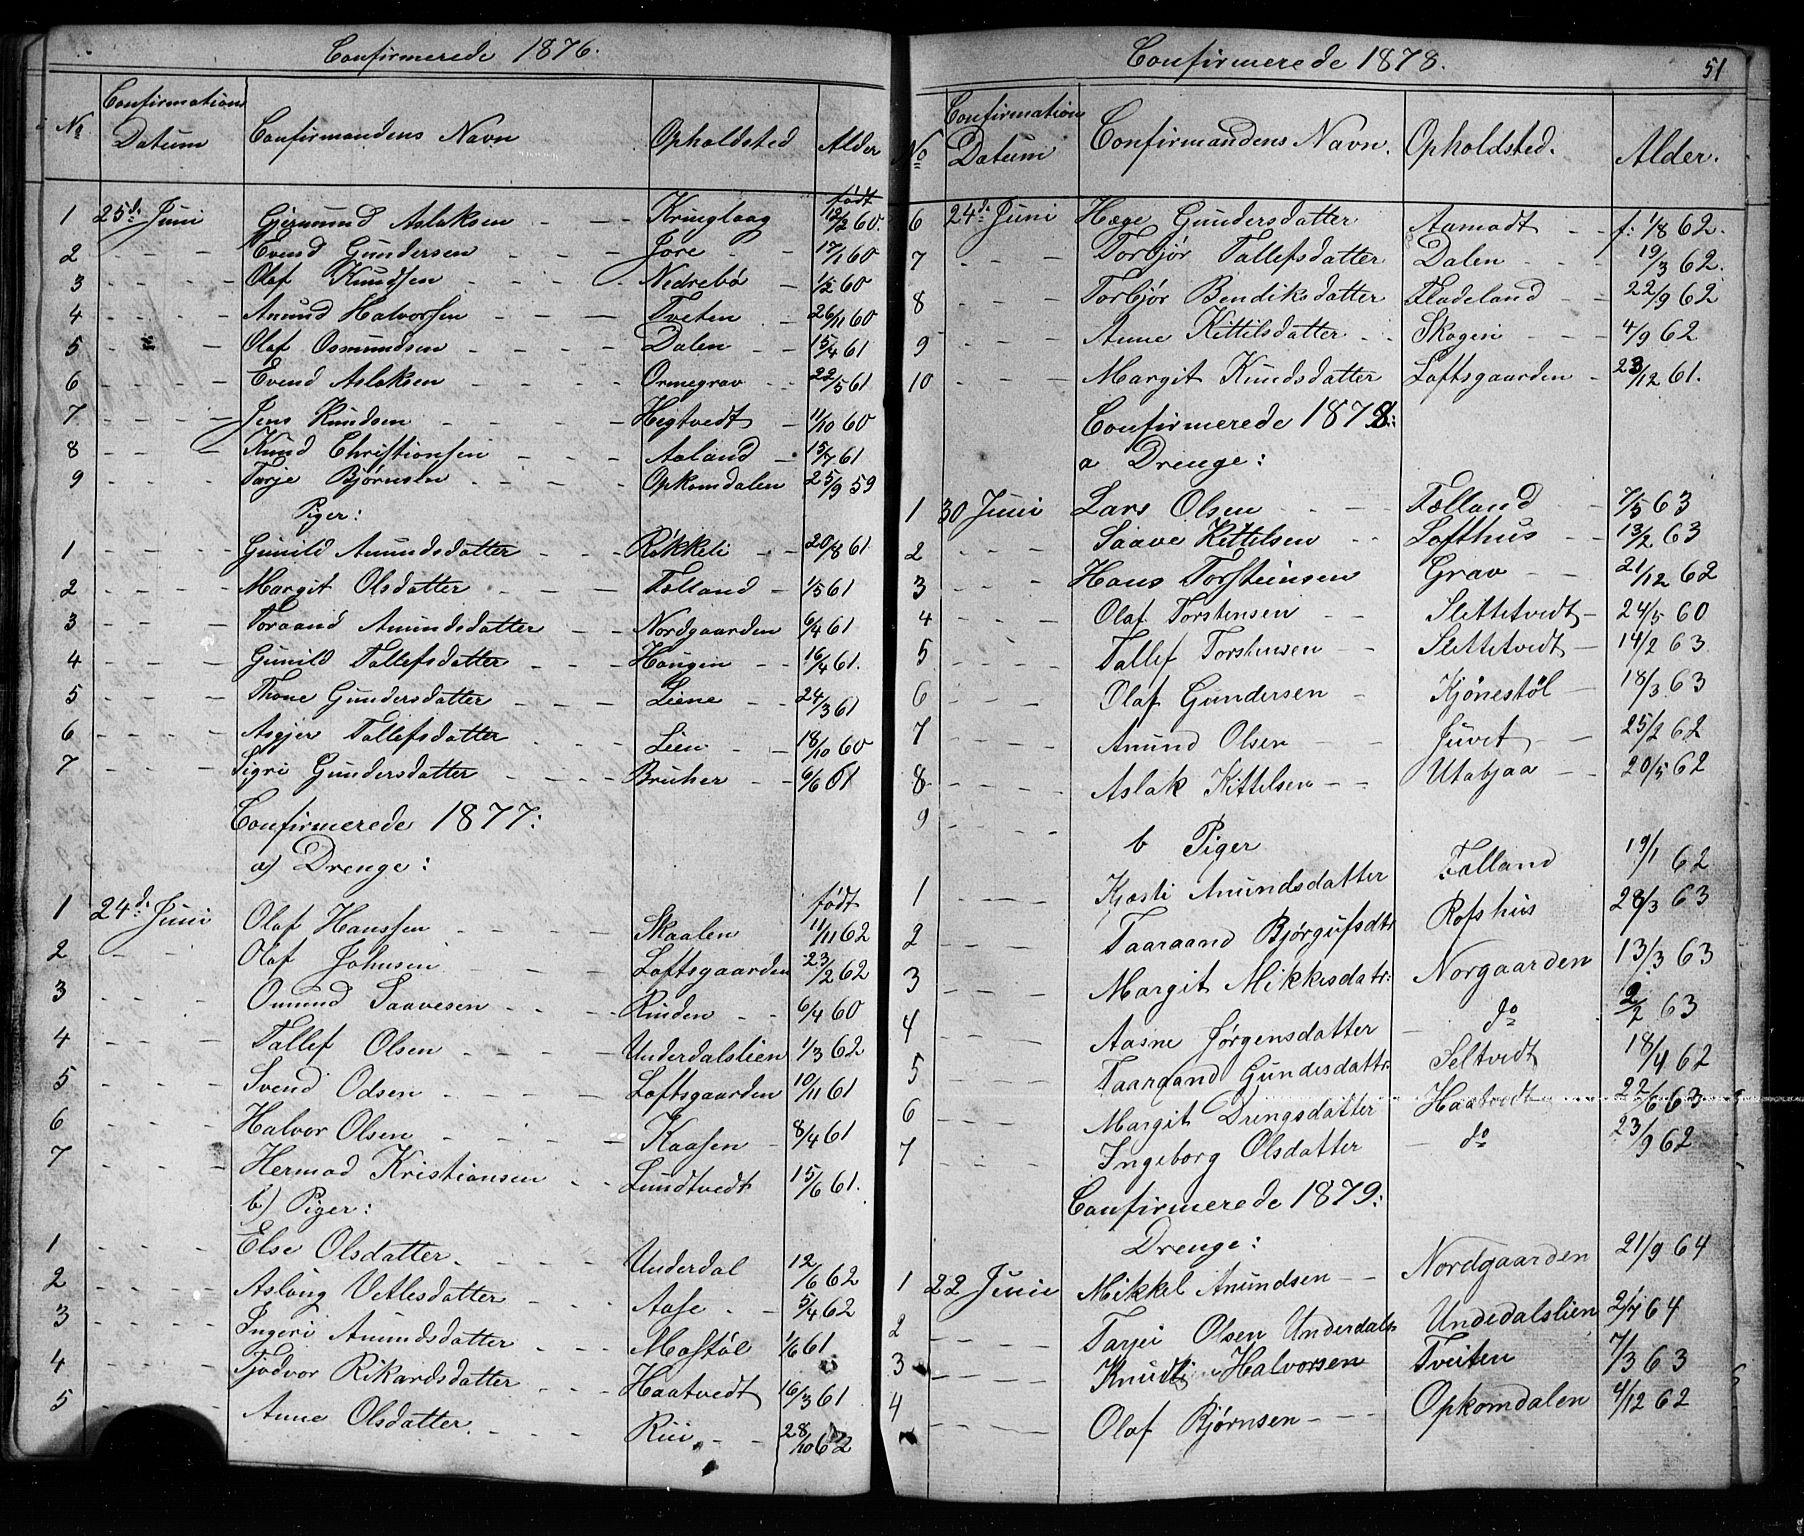 SAKO, Mo kirkebøker, G/Ga/L0001: Klokkerbok nr. I 1, 1851-1891, s. 51